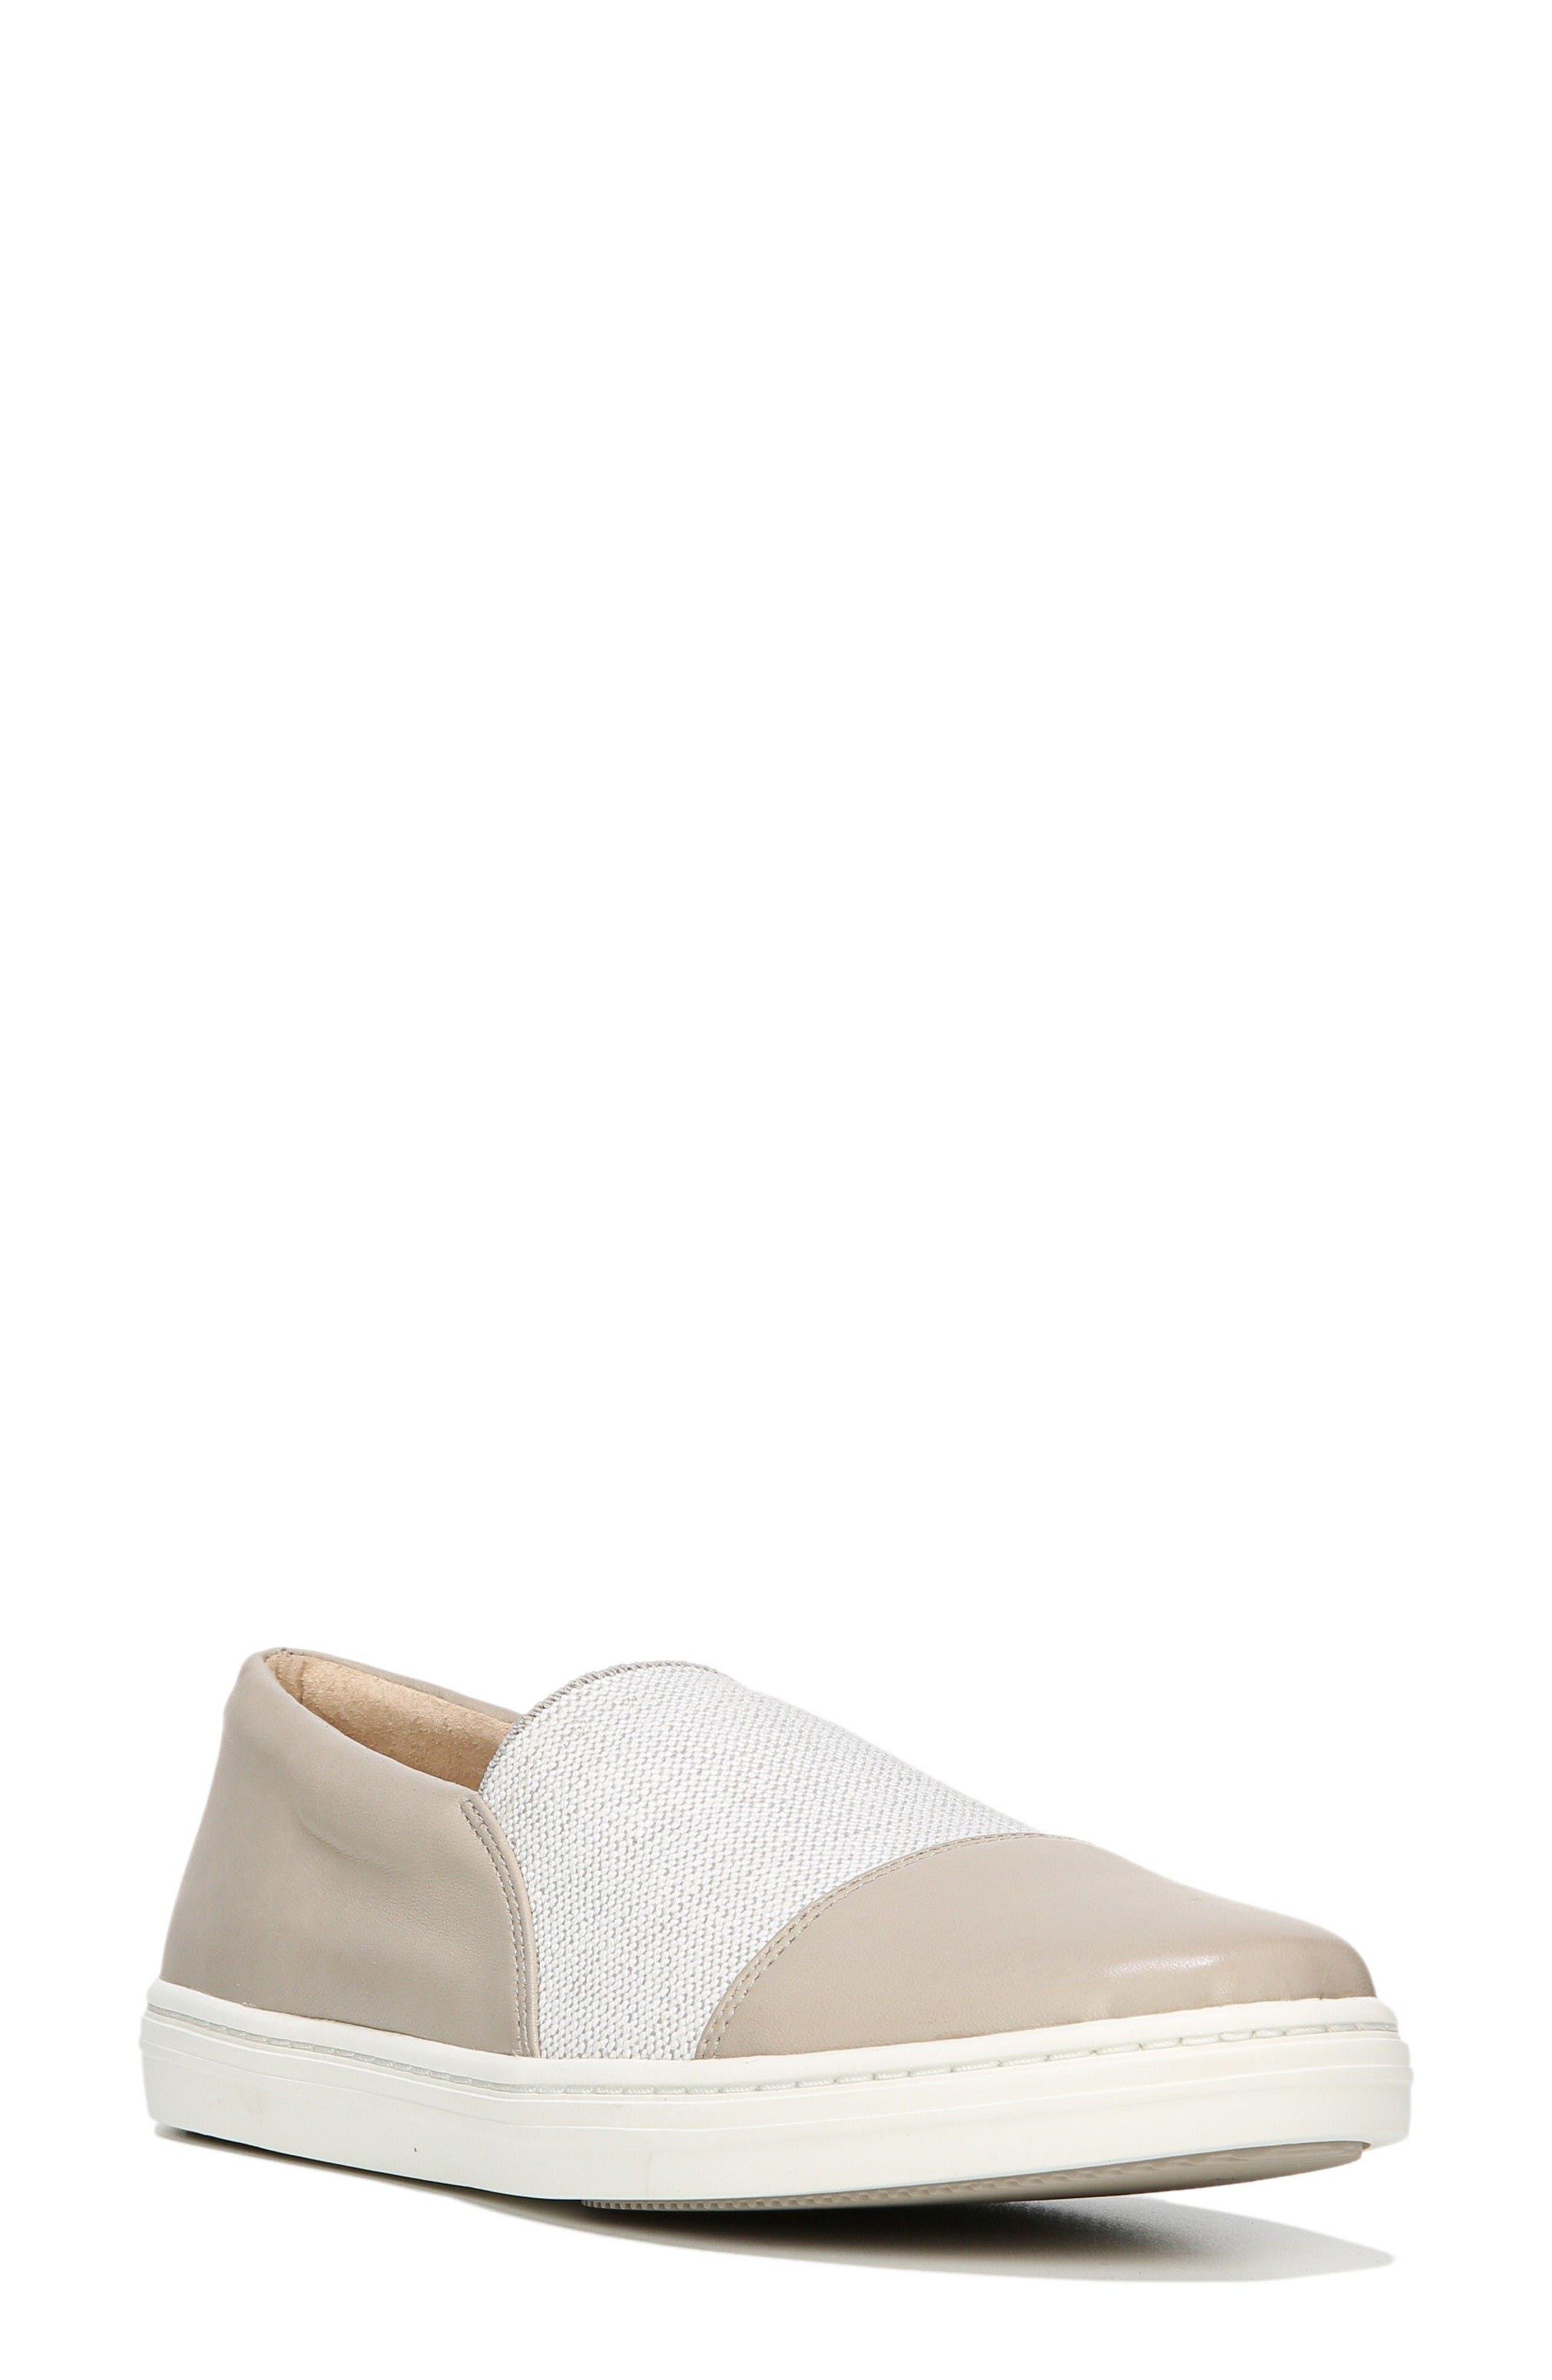 Raine Slip-On Sneaker,                         Main,                         color, Pavillion Grey Leather